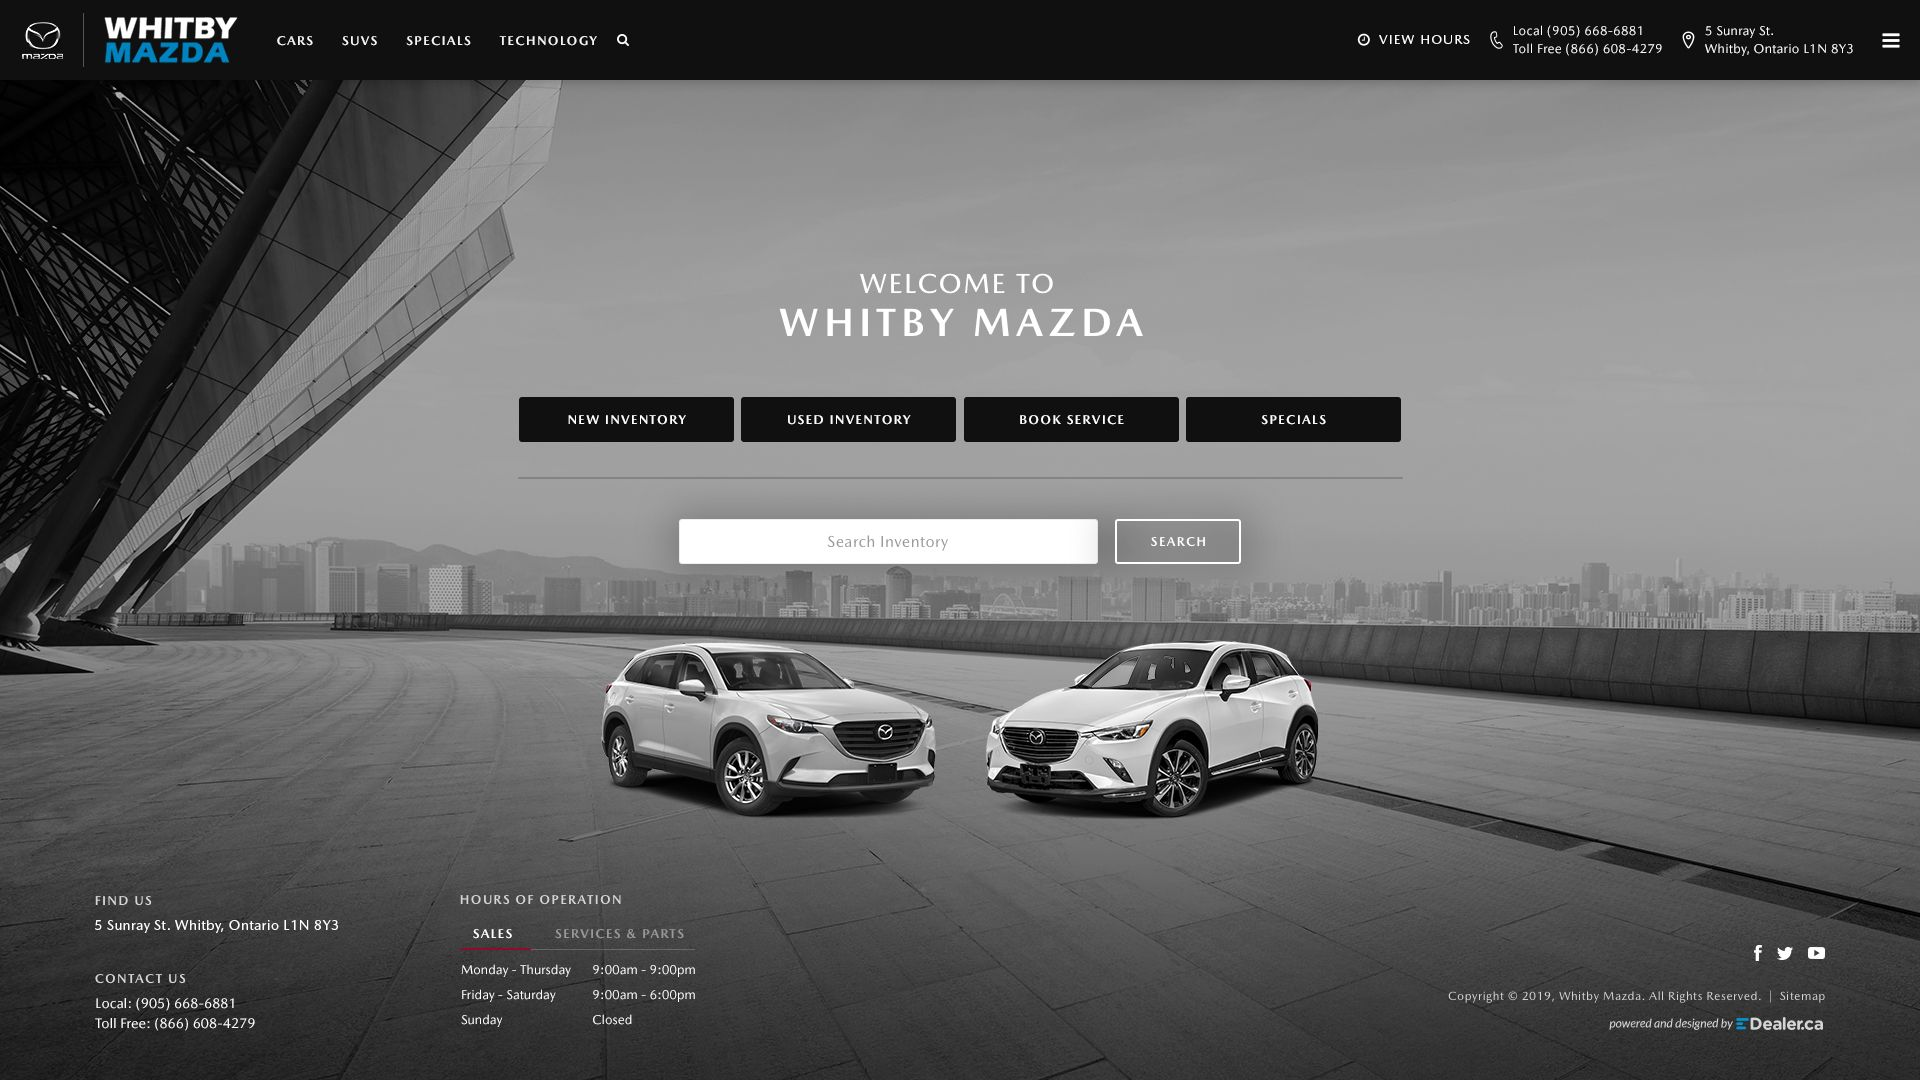 Whitby Mazda